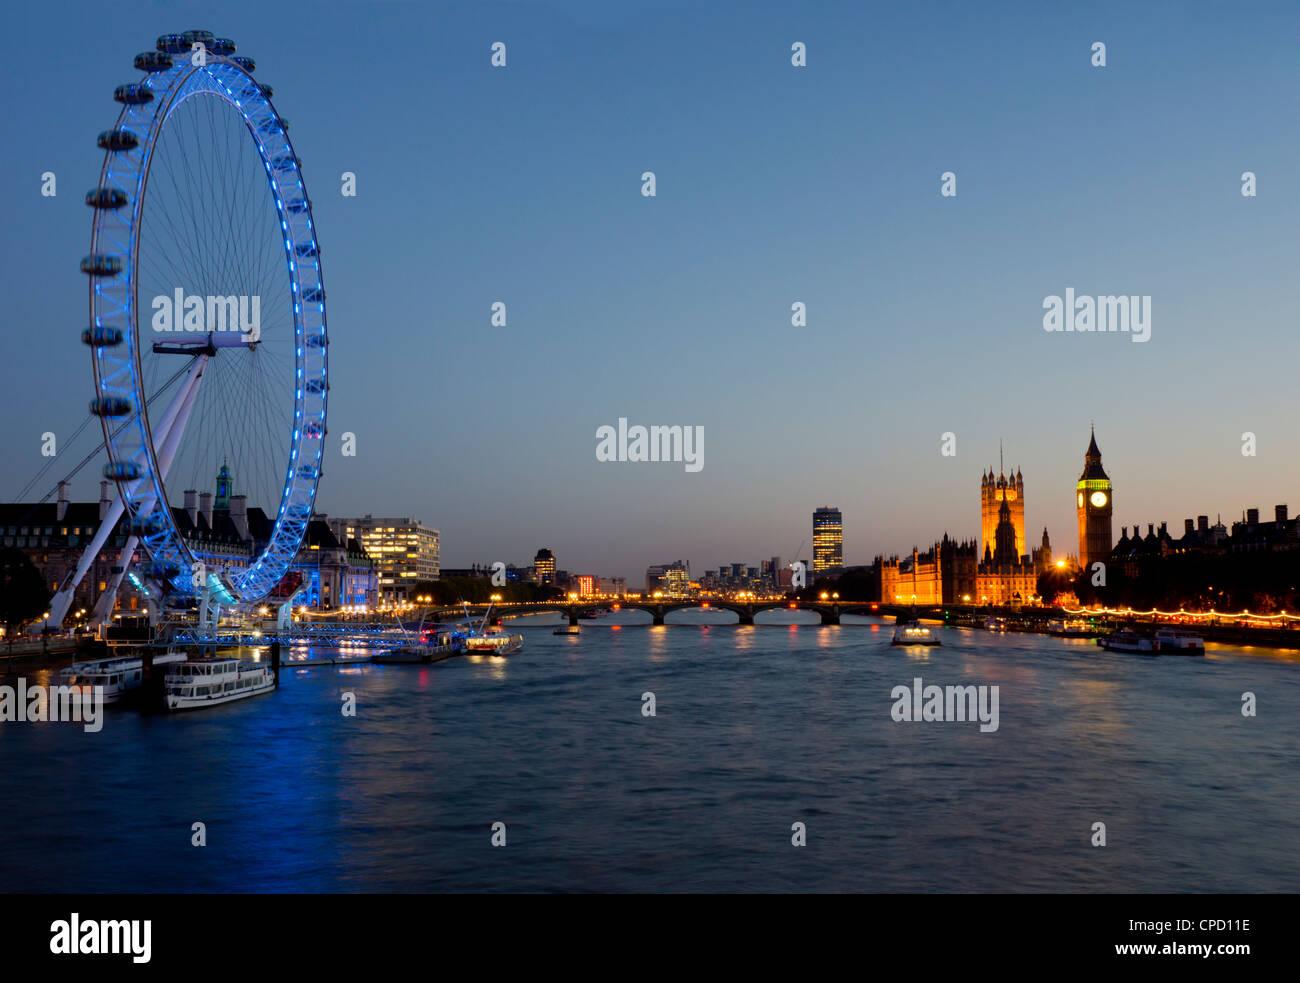 Houses of Parliament, Westminster and London Eye at dusk, London, England, United Kingdom, Europe - Stock Image